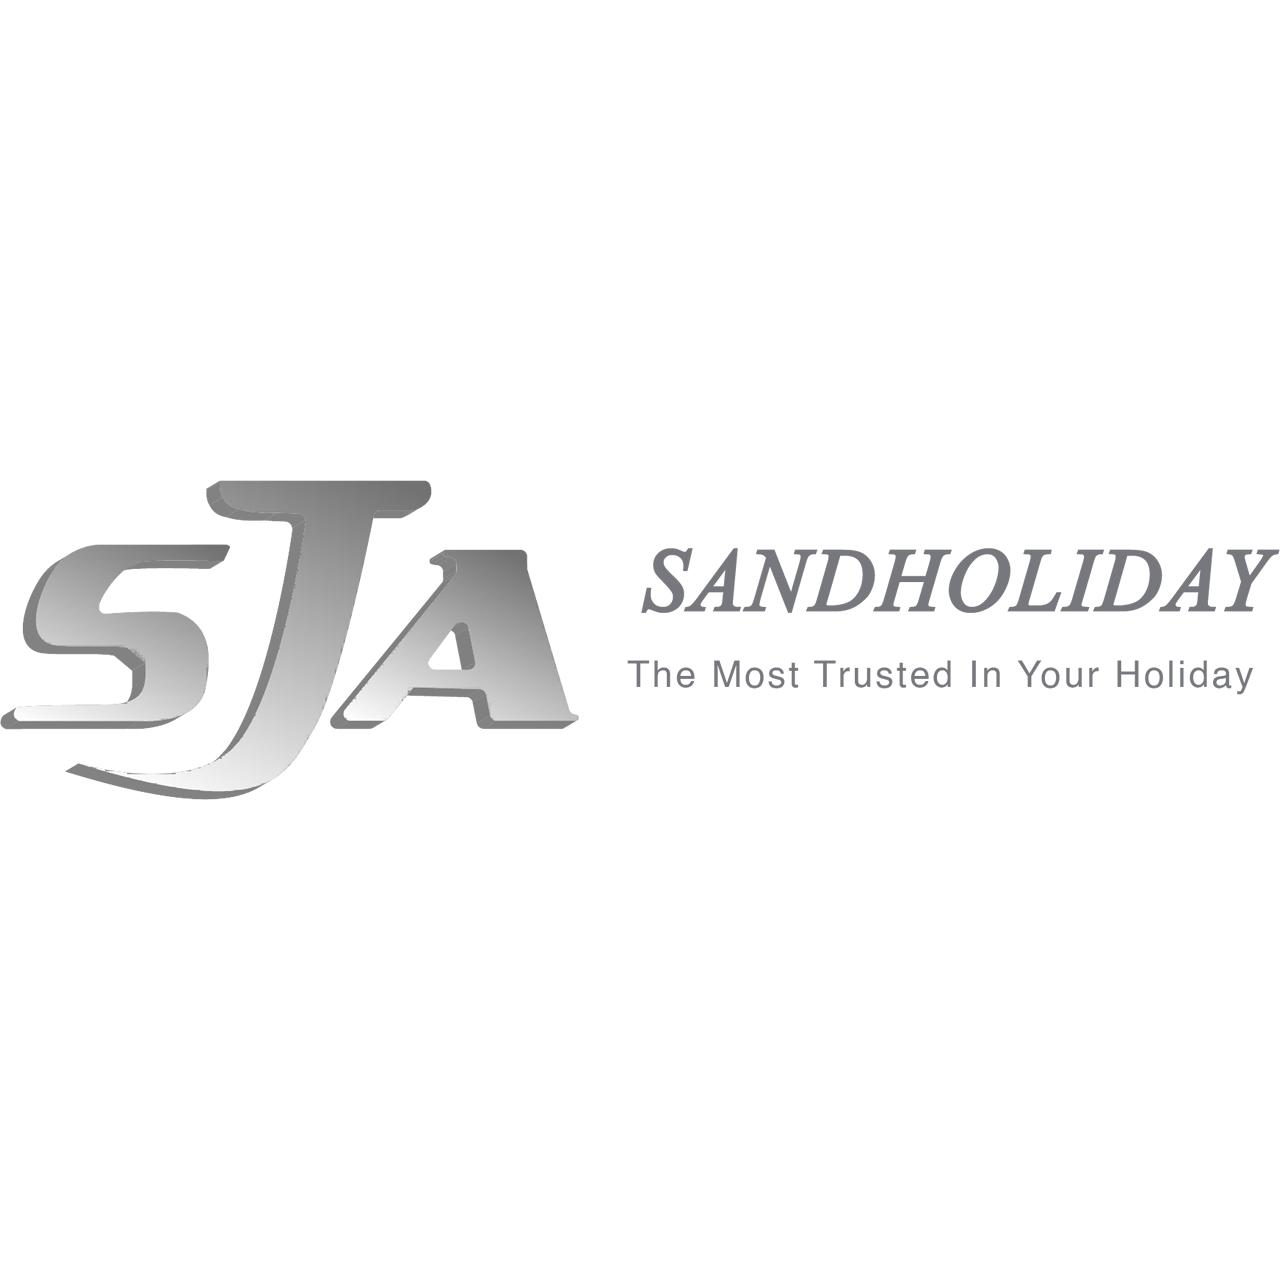 Sandholiday Bali primary image